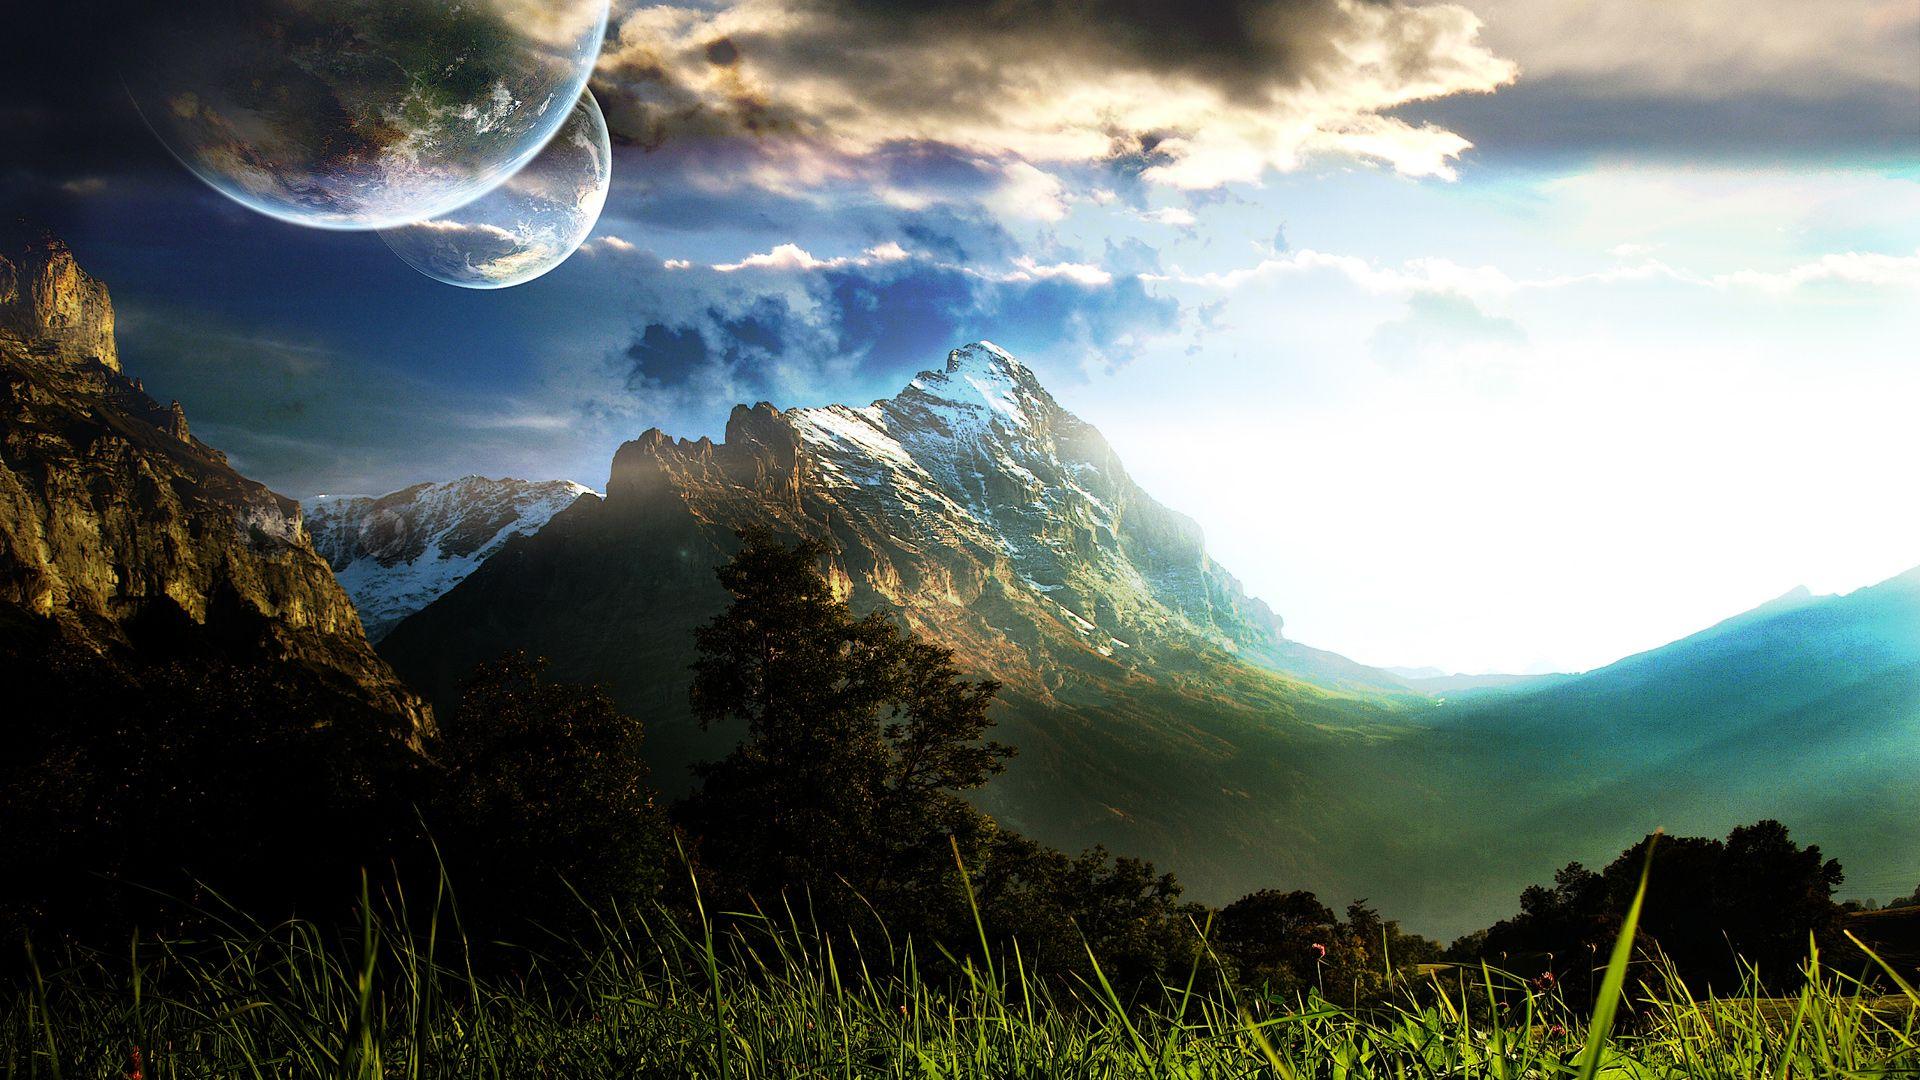 Sci Fi Landscape With Images Landscape Wallpaper Background